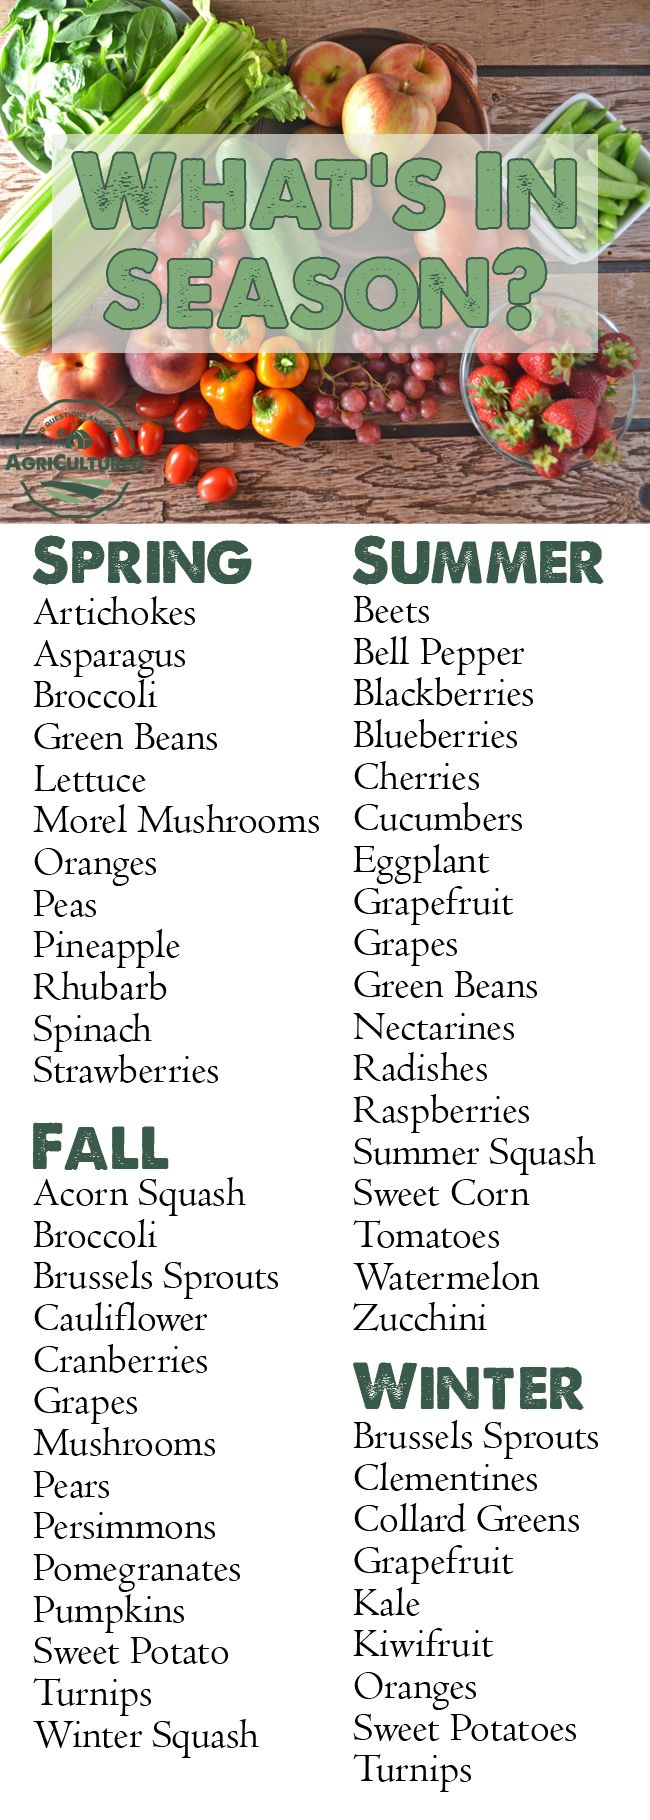 Low carb vegetables chart Printable – 2019 Printable calendar